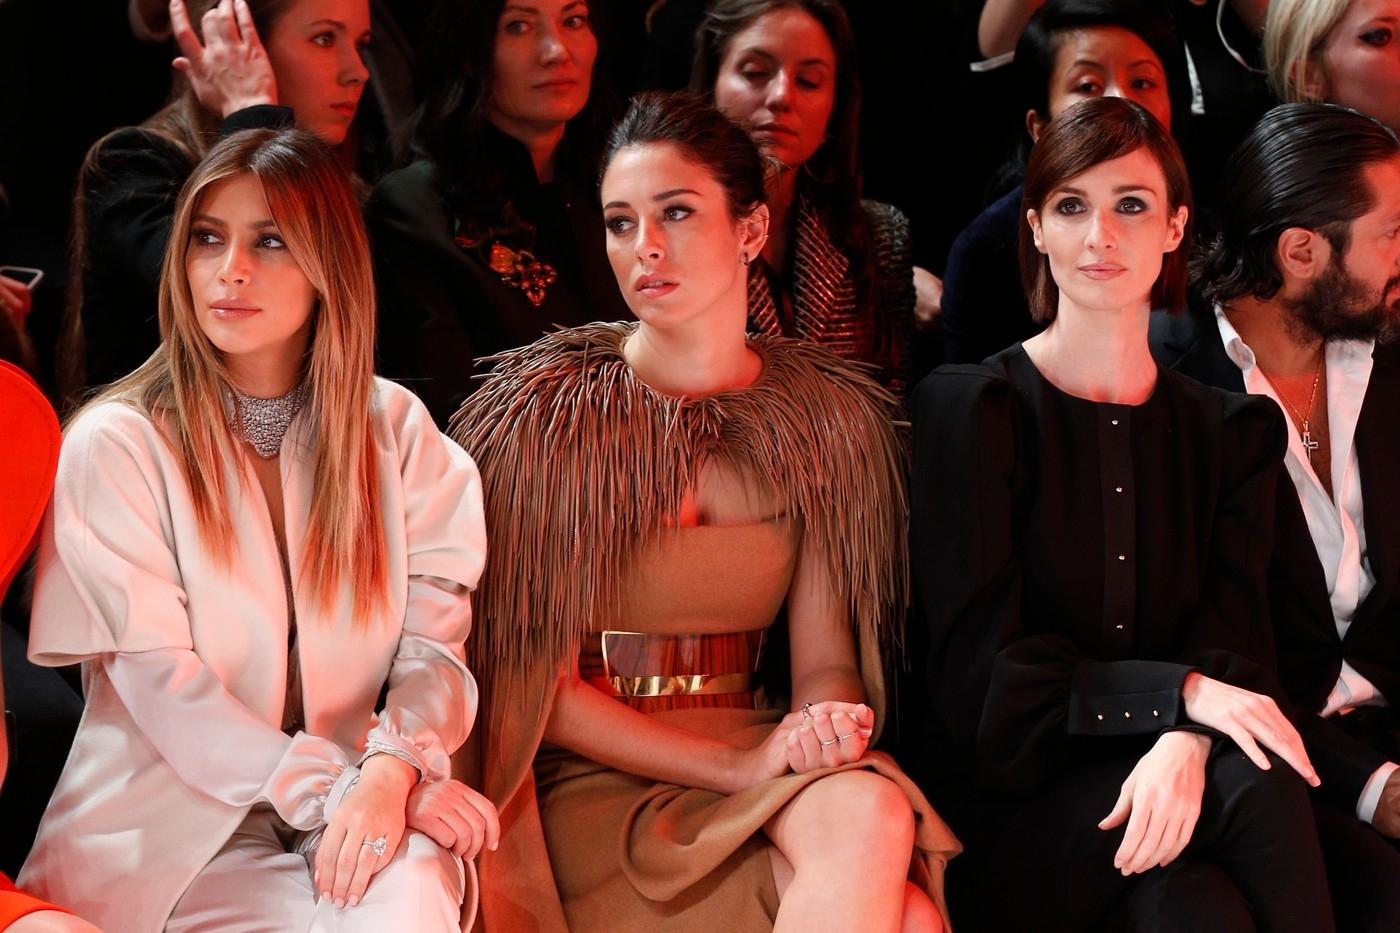 Kim Kardashian attends the Stephane Rolland show